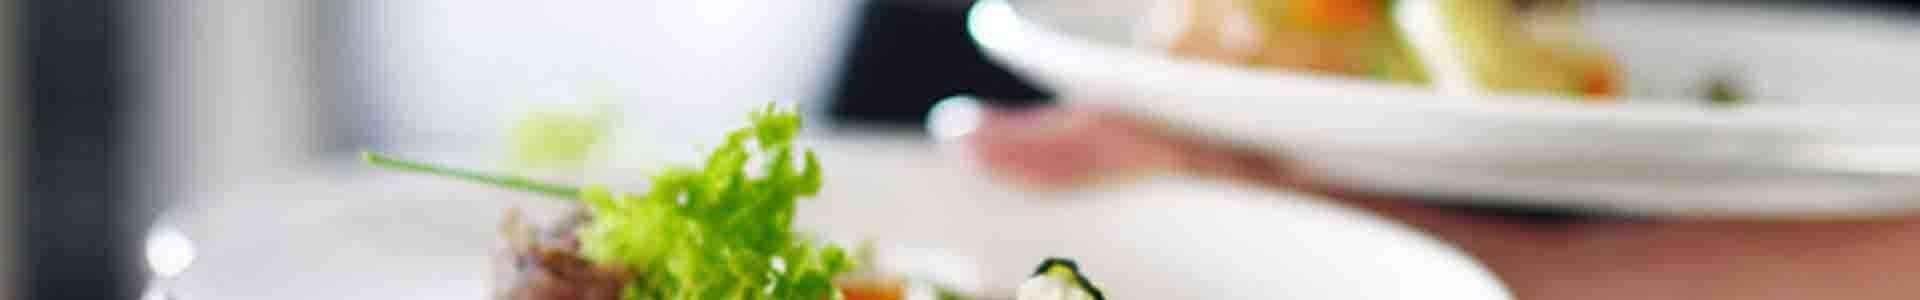 Menaje y utensilios para hosteler a 6 servimenaje for Menaje hosteleria